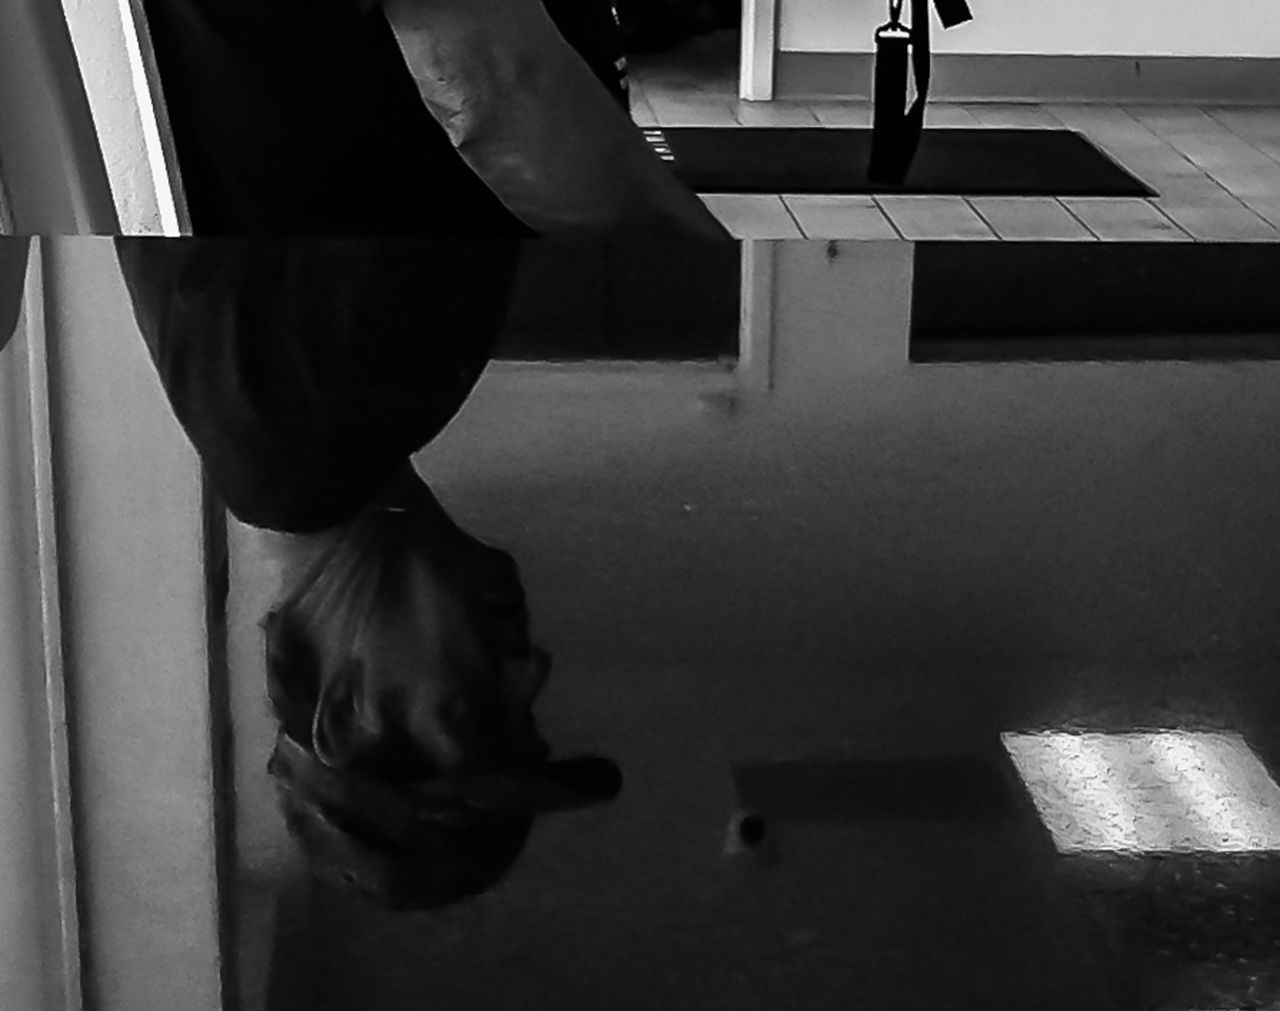 Black & White Black And White Blackandwhite Photography IPhone Photography IPhoneography Iphonephotography Street Photography Streetphoto_bw Streetphotography